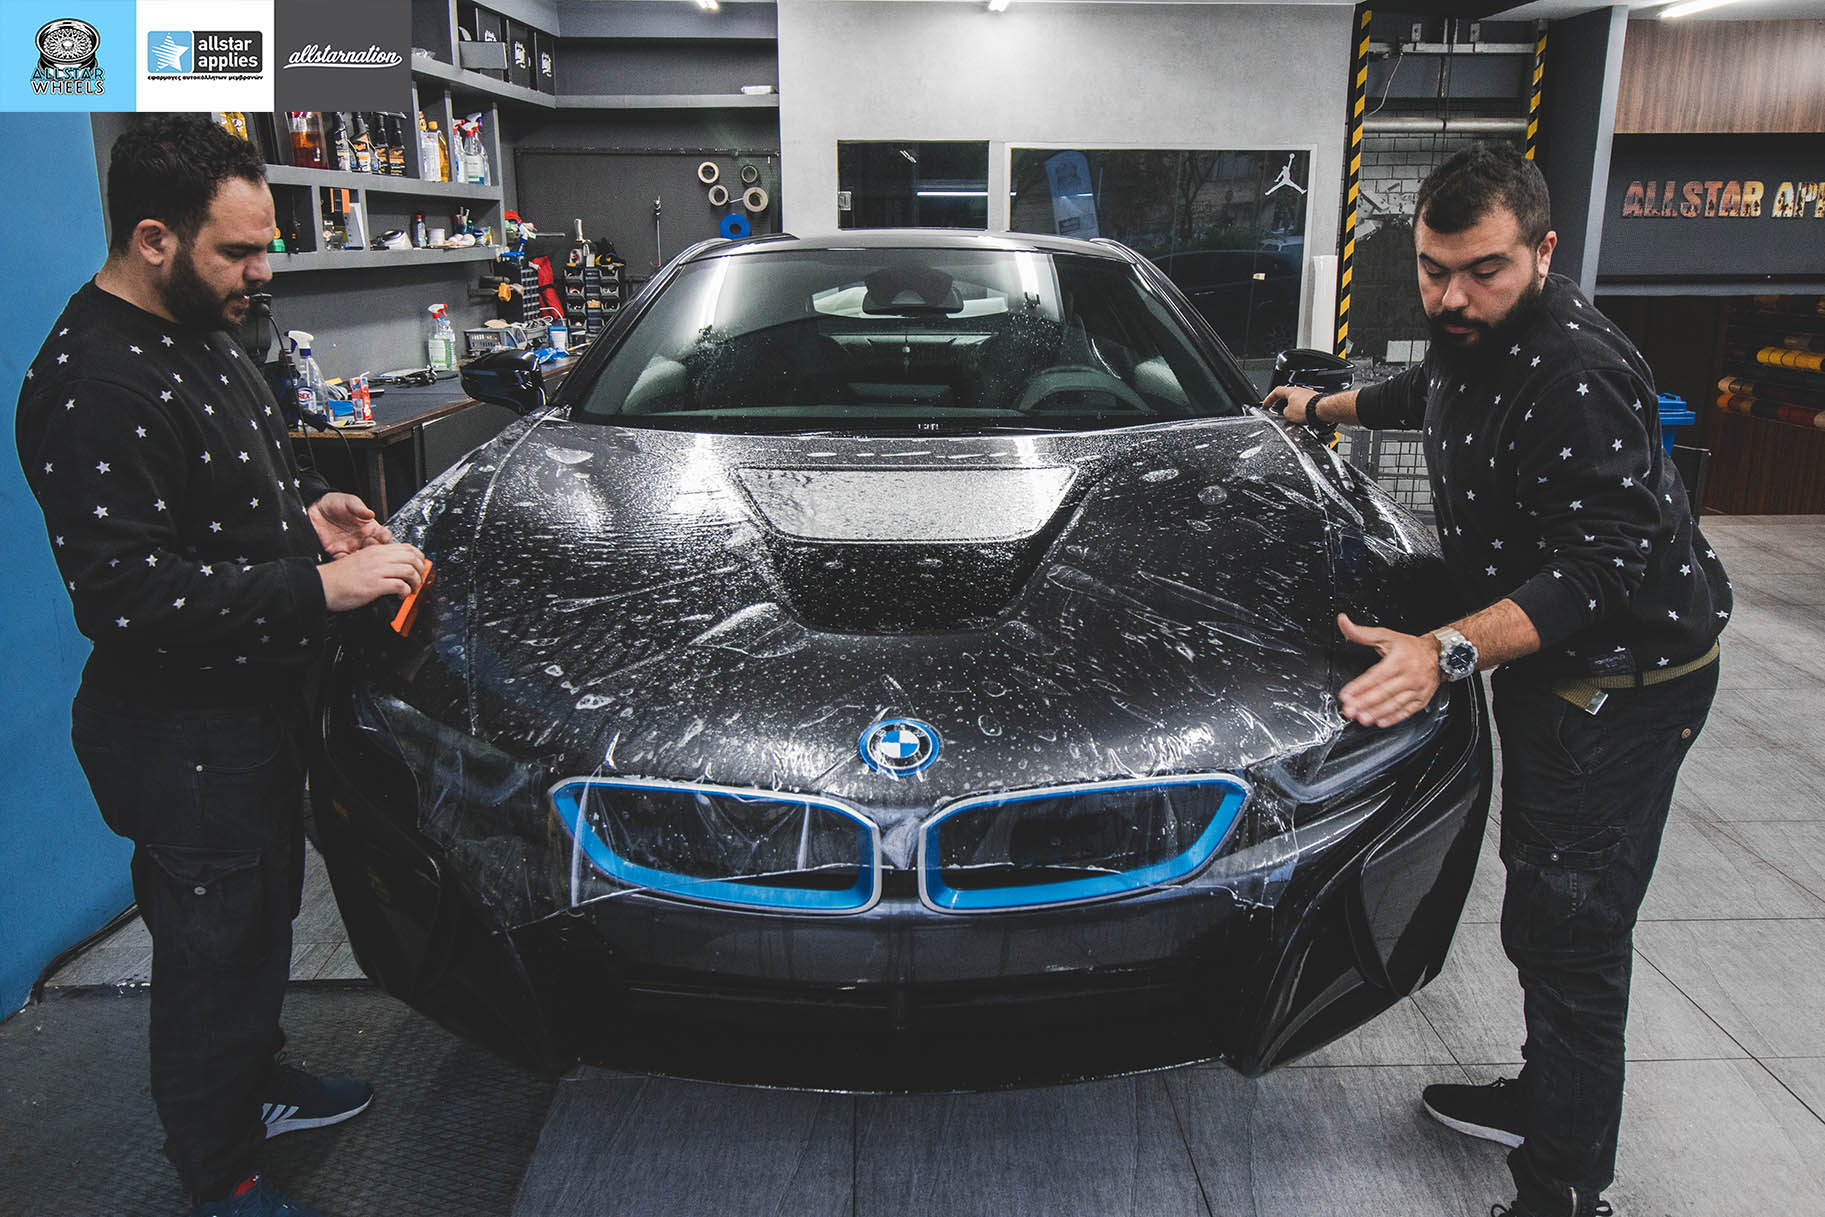 BMW I8 – Μεμβράνες προστασίας χρώματος By allstar applies in thessaloniki